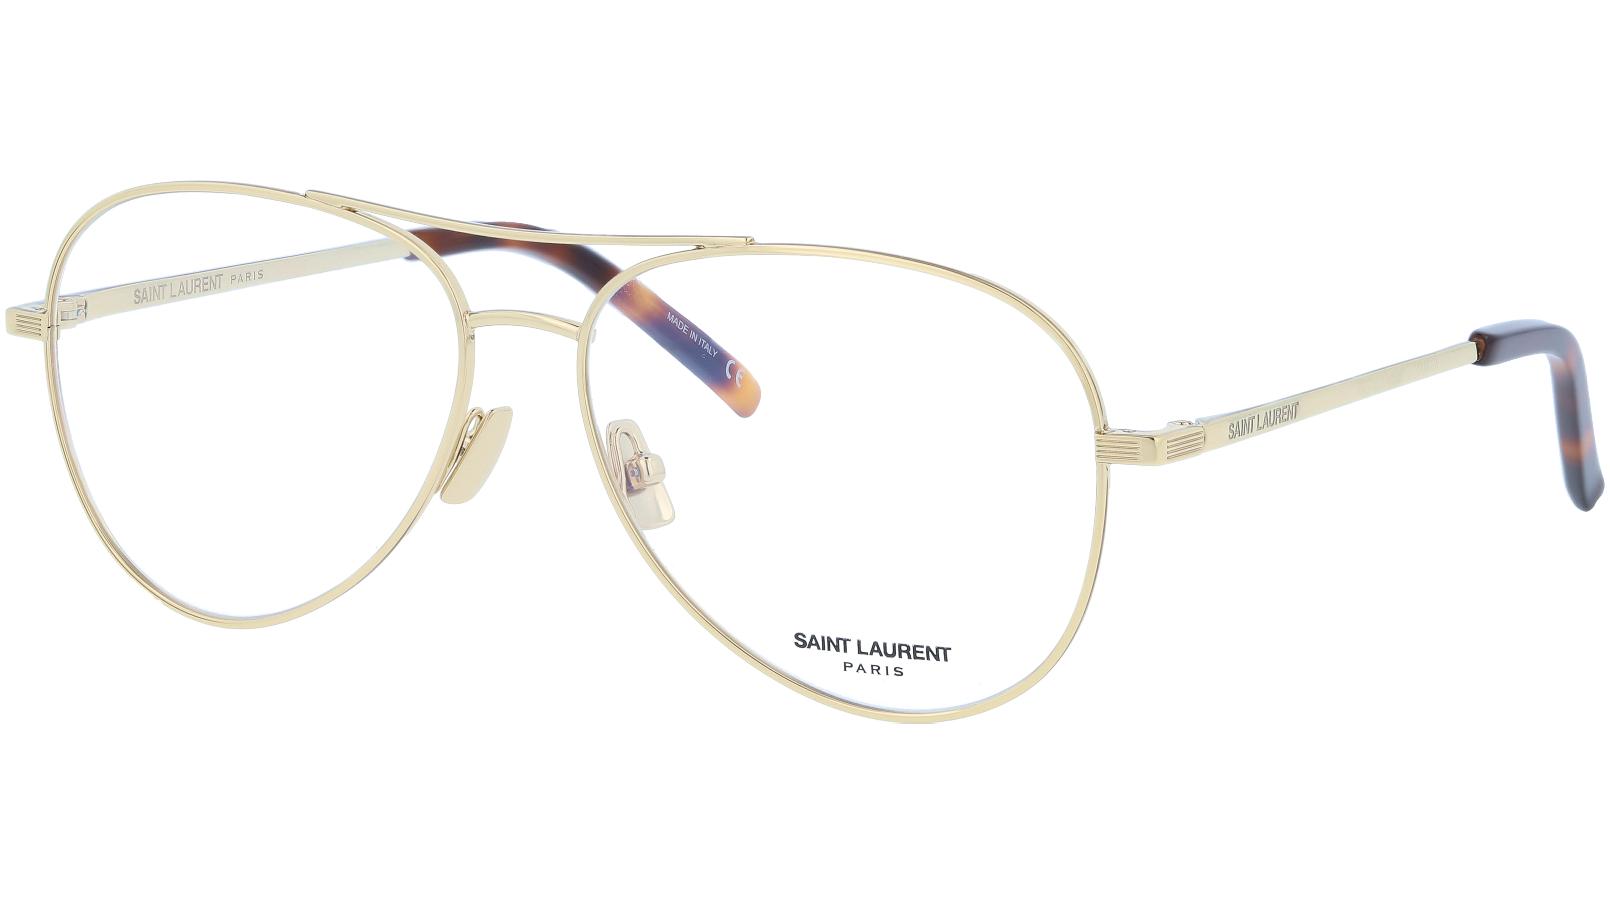 Saint Laurent SL153 002 57 Gold Glasses